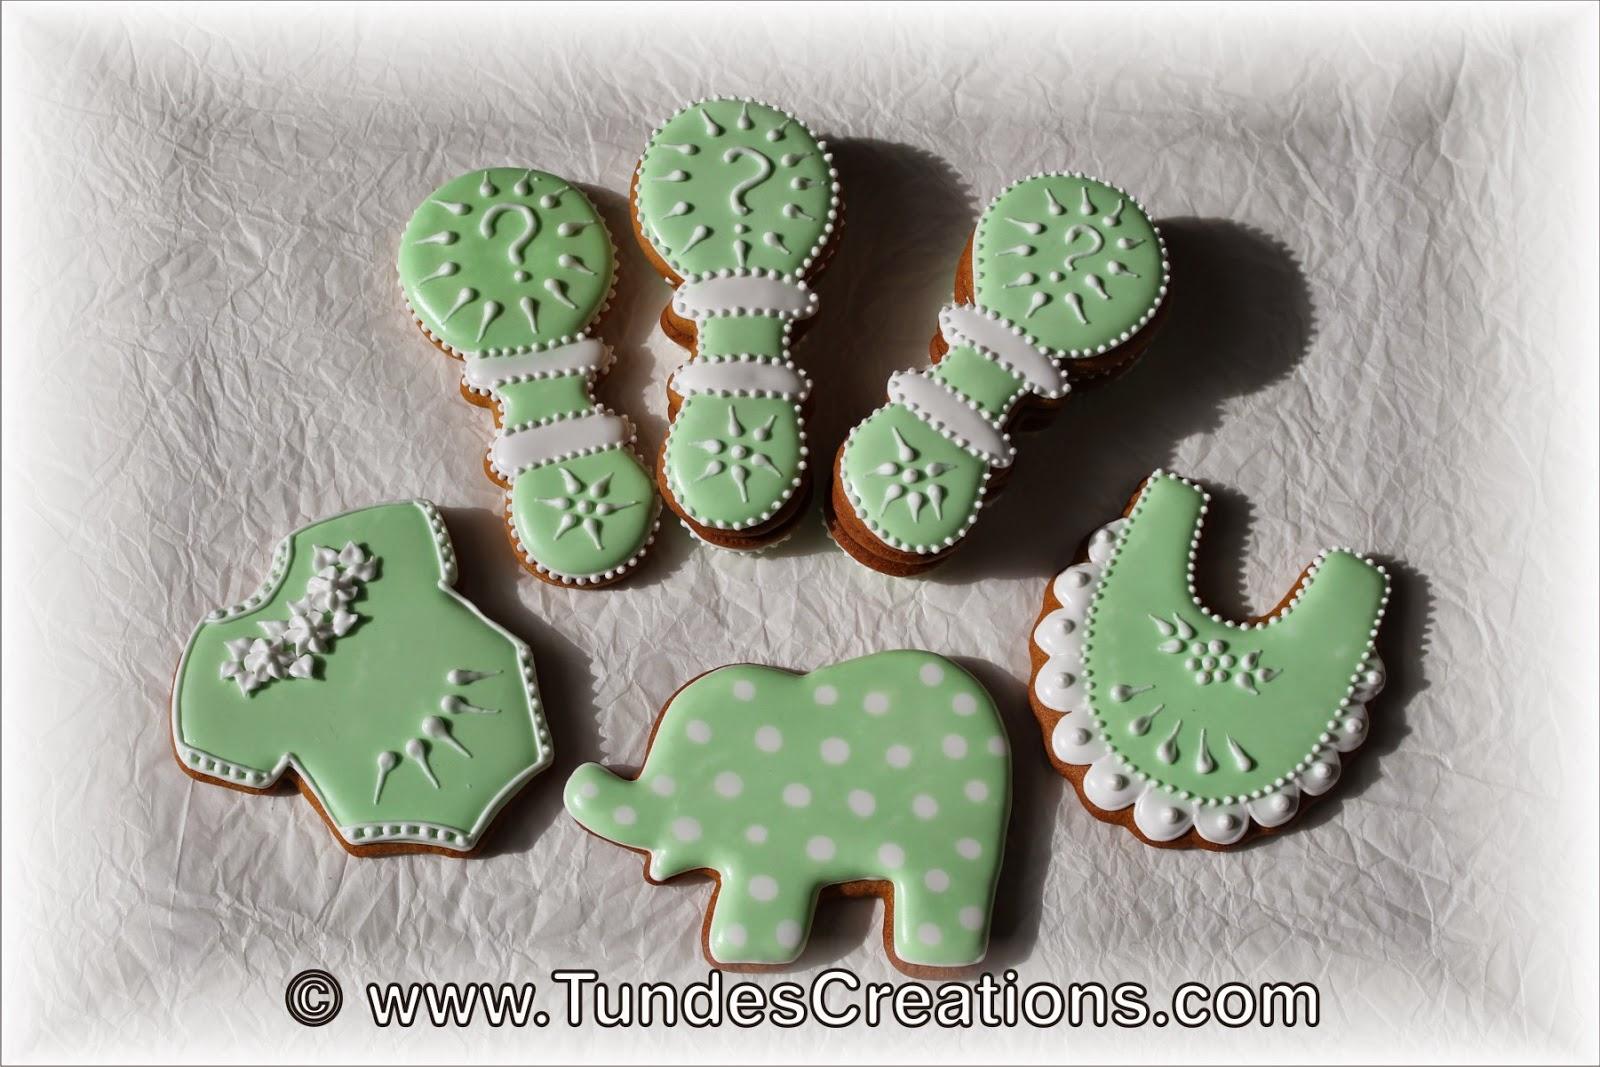 Baby shower cookies with gender reveal cookies